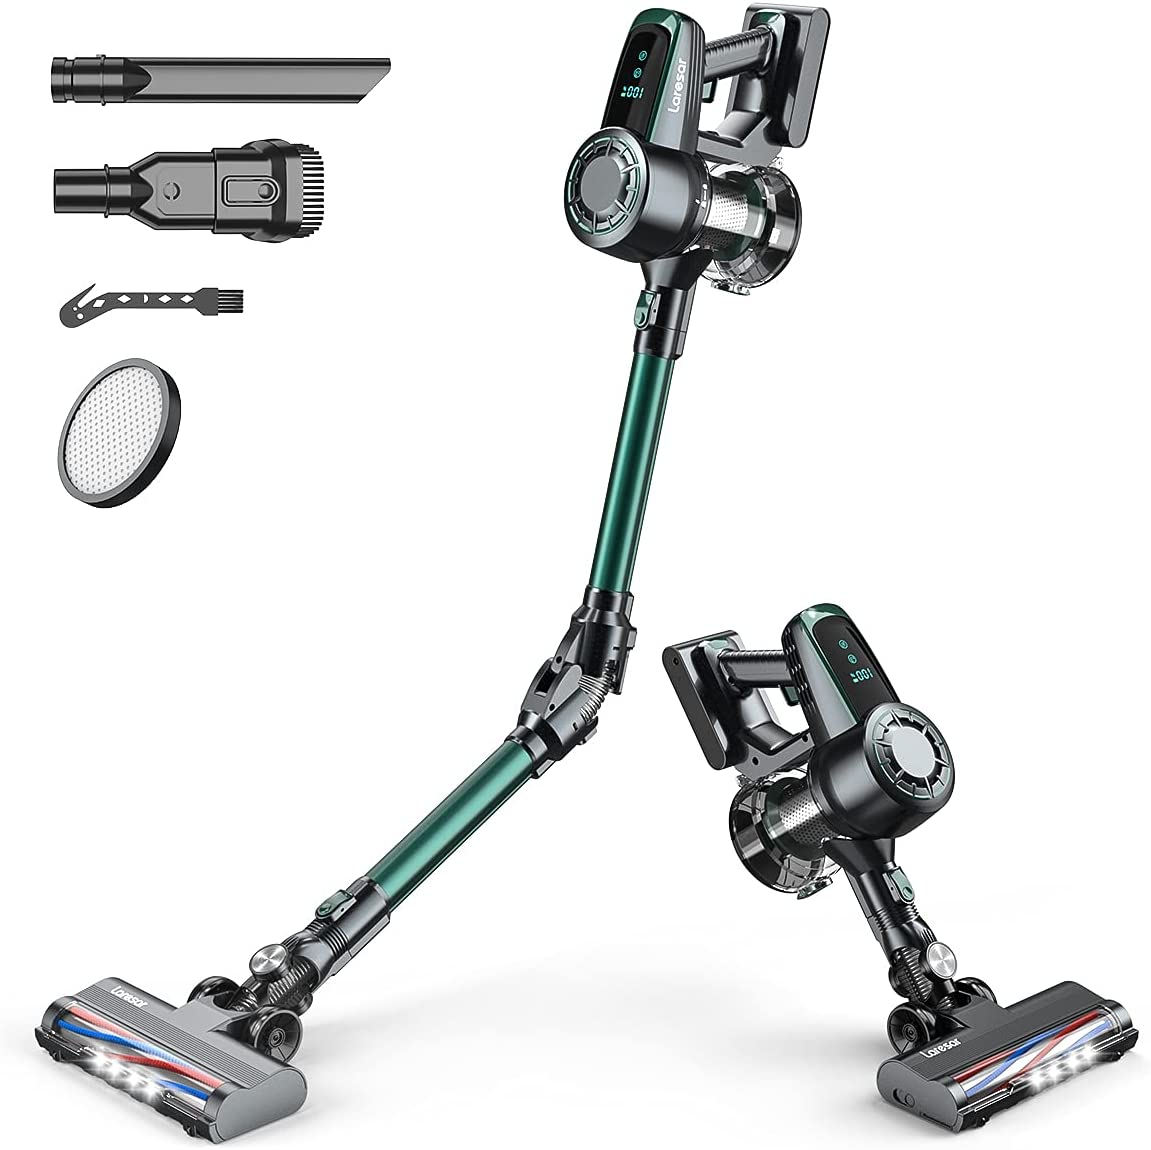 Max 40% OFF Laresar Cordless Vacuum Cleaner Mail order 25KPA Suction Powerful Stick Va